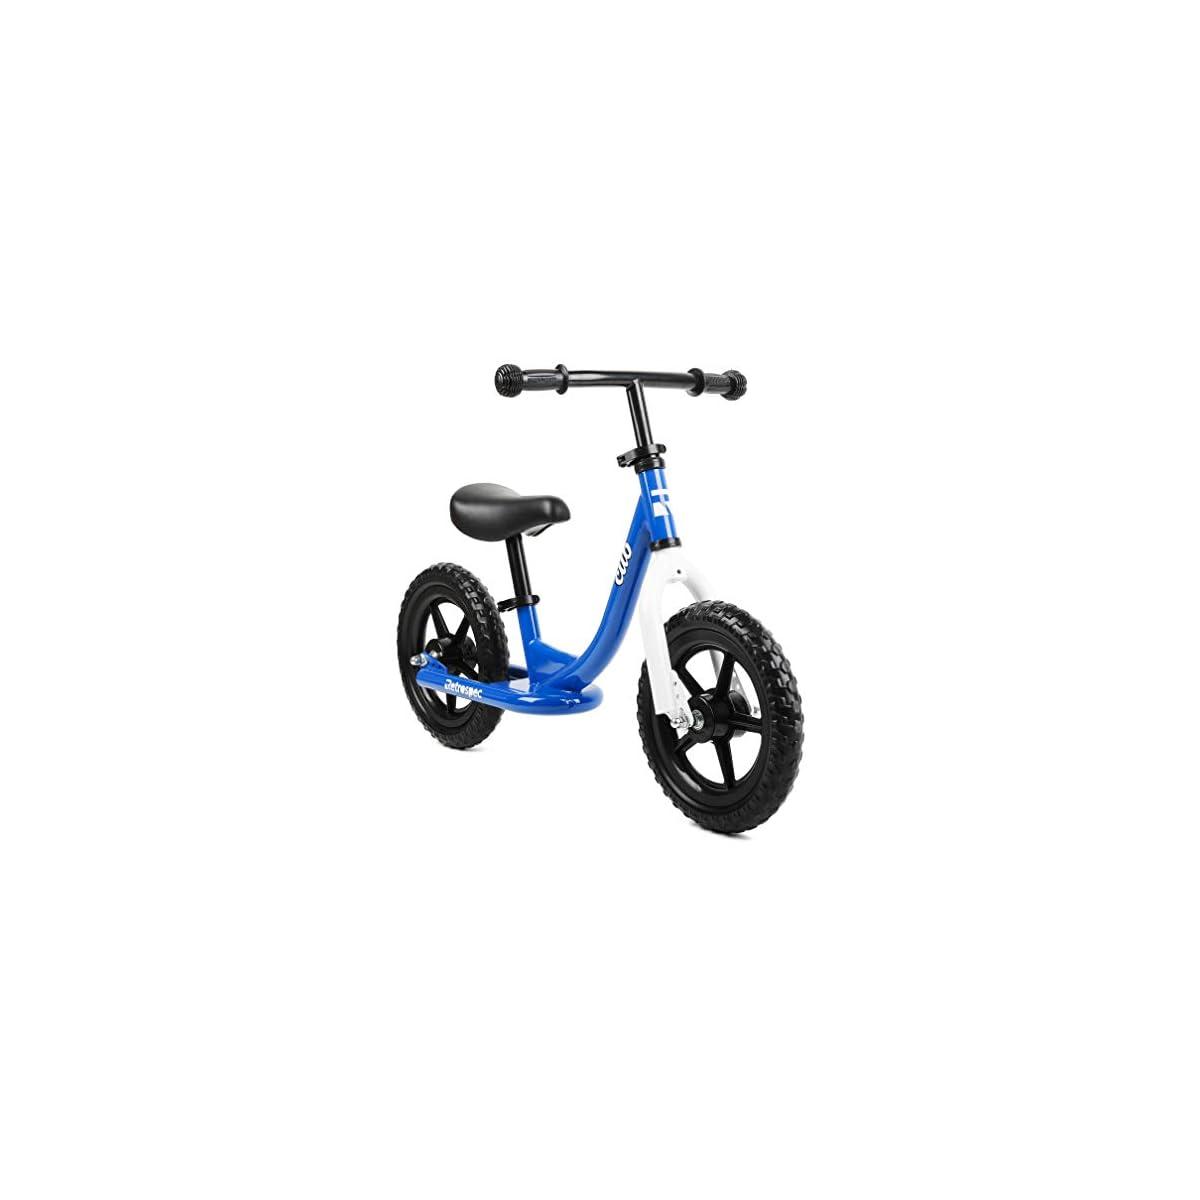 SaleProductsOffer - No.1 Best Online Store 41eZkmaruUL Retrospec Cub Kids Balance Bike No Pedal Bicycle